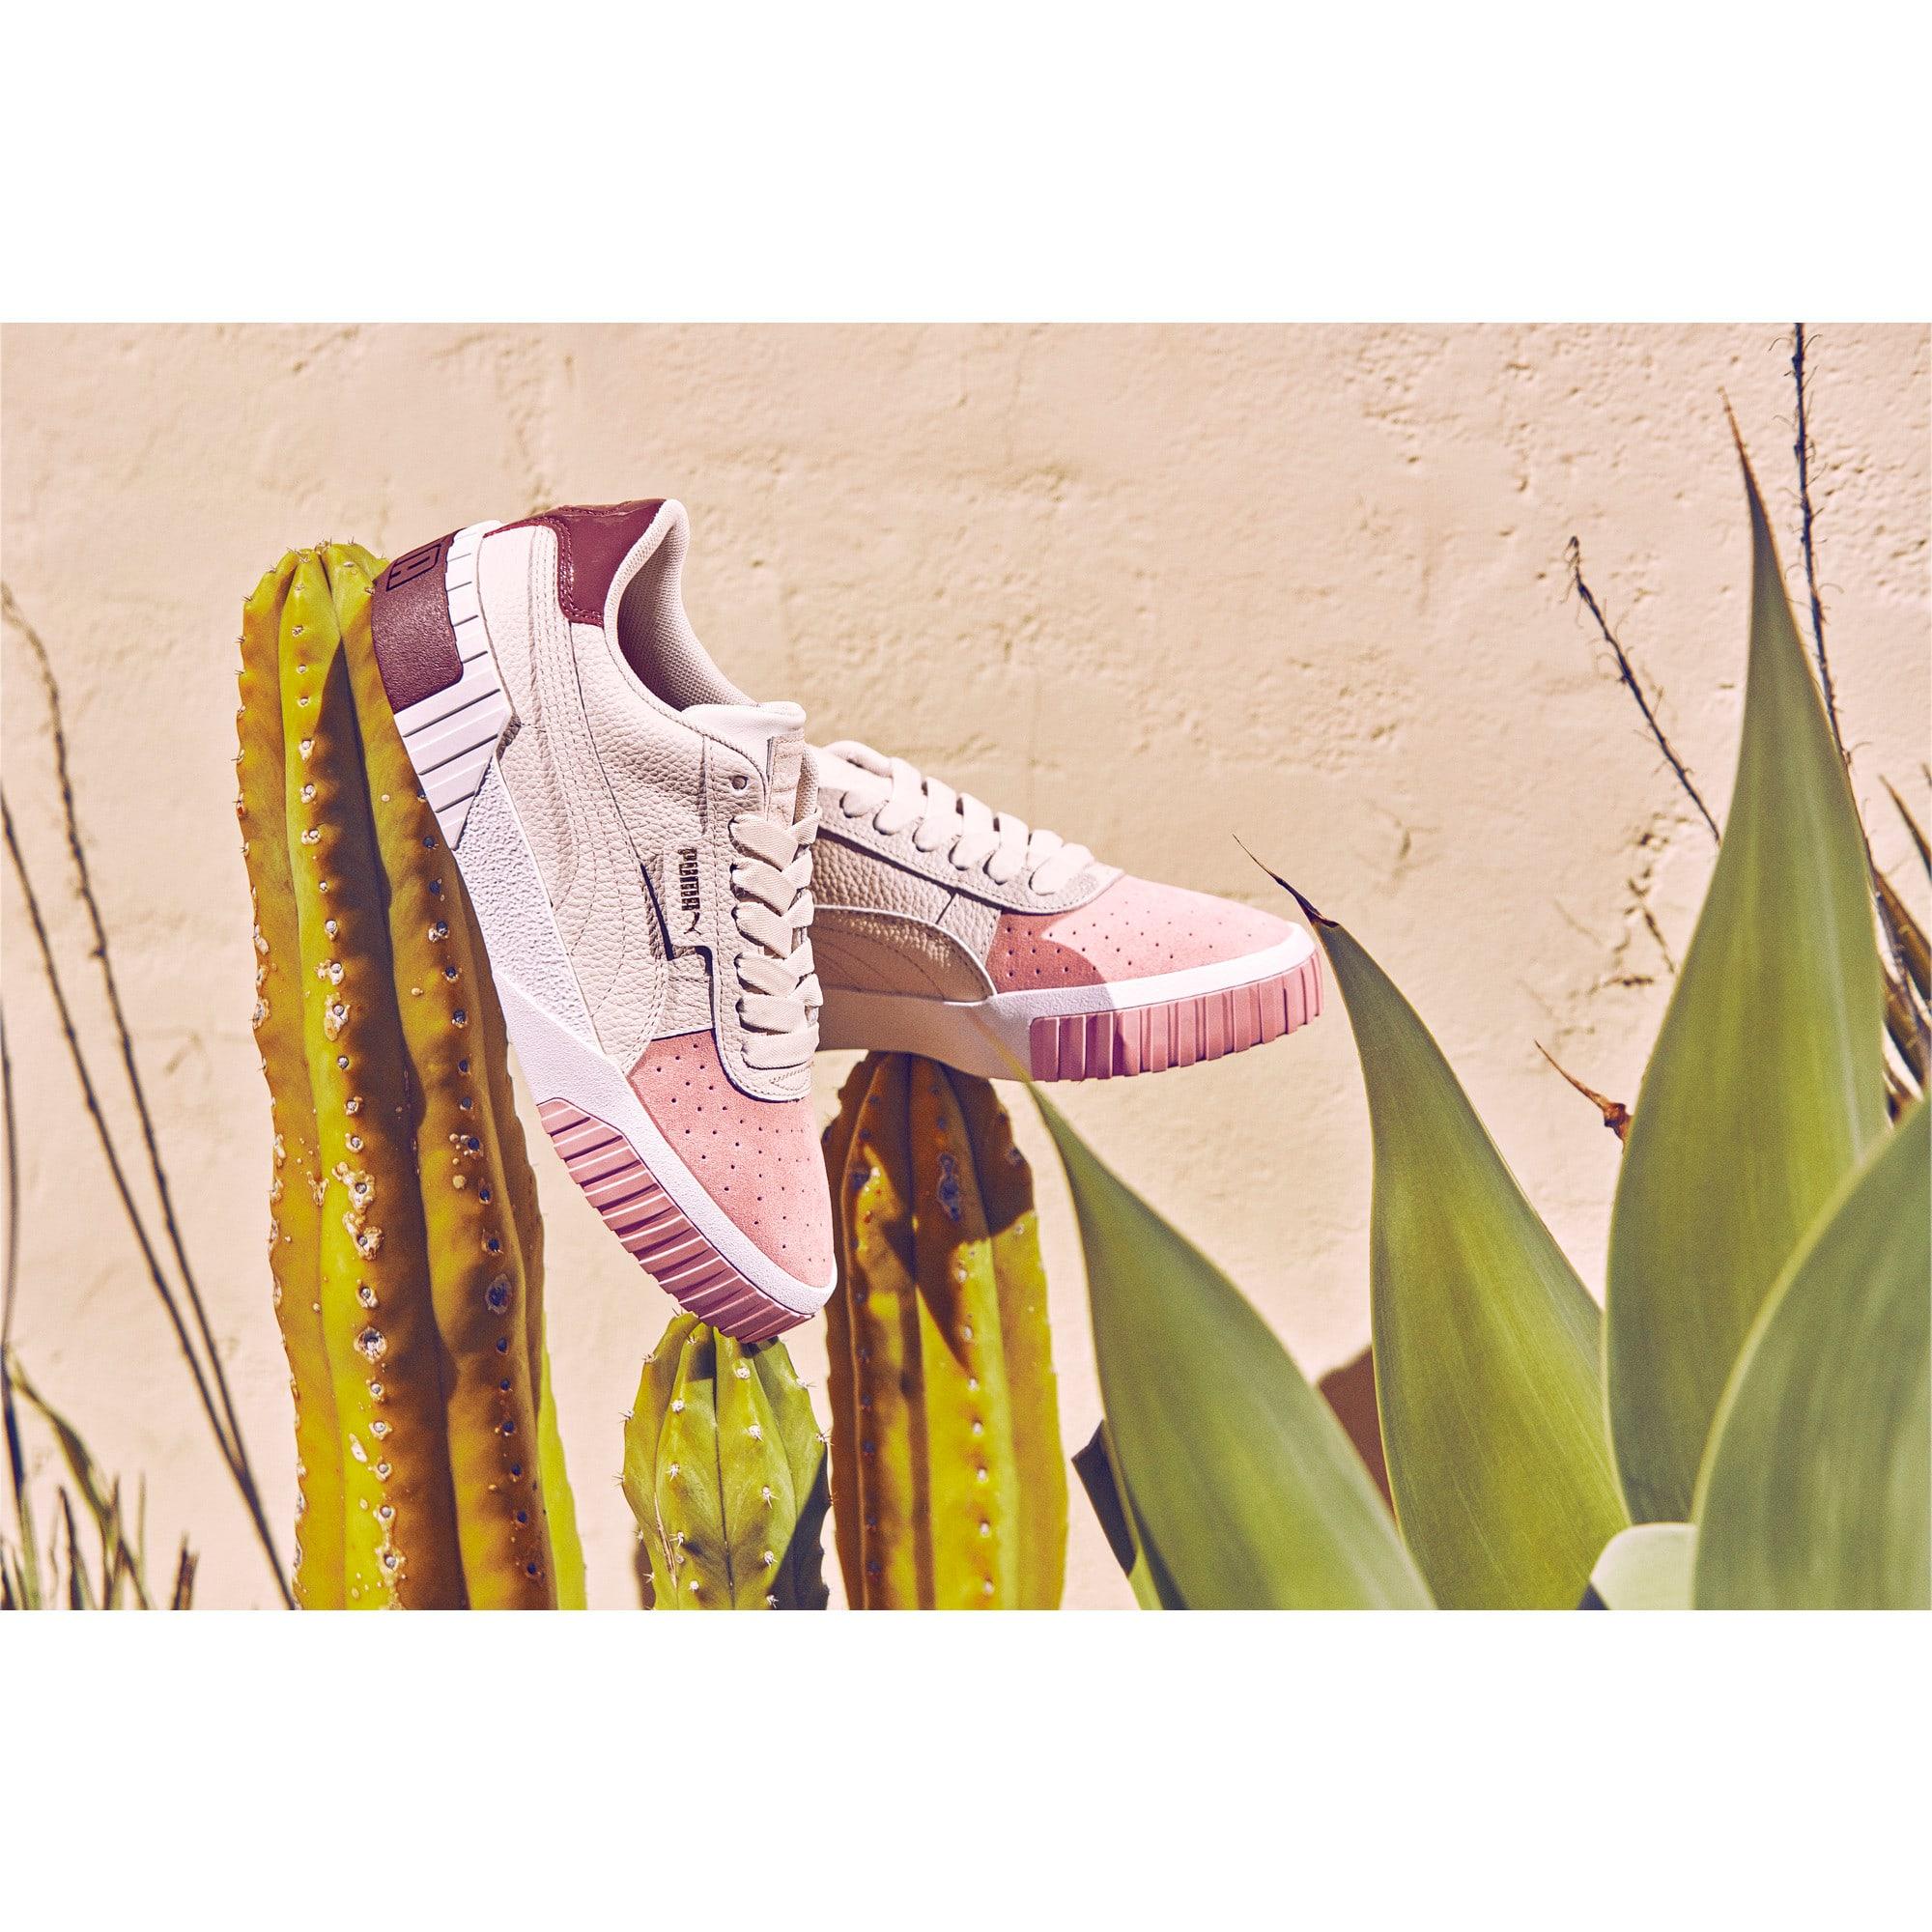 Thumbnail 9 of Cali Remix Women's Sneakers, Pastel Parchment-Bridal Rose, medium